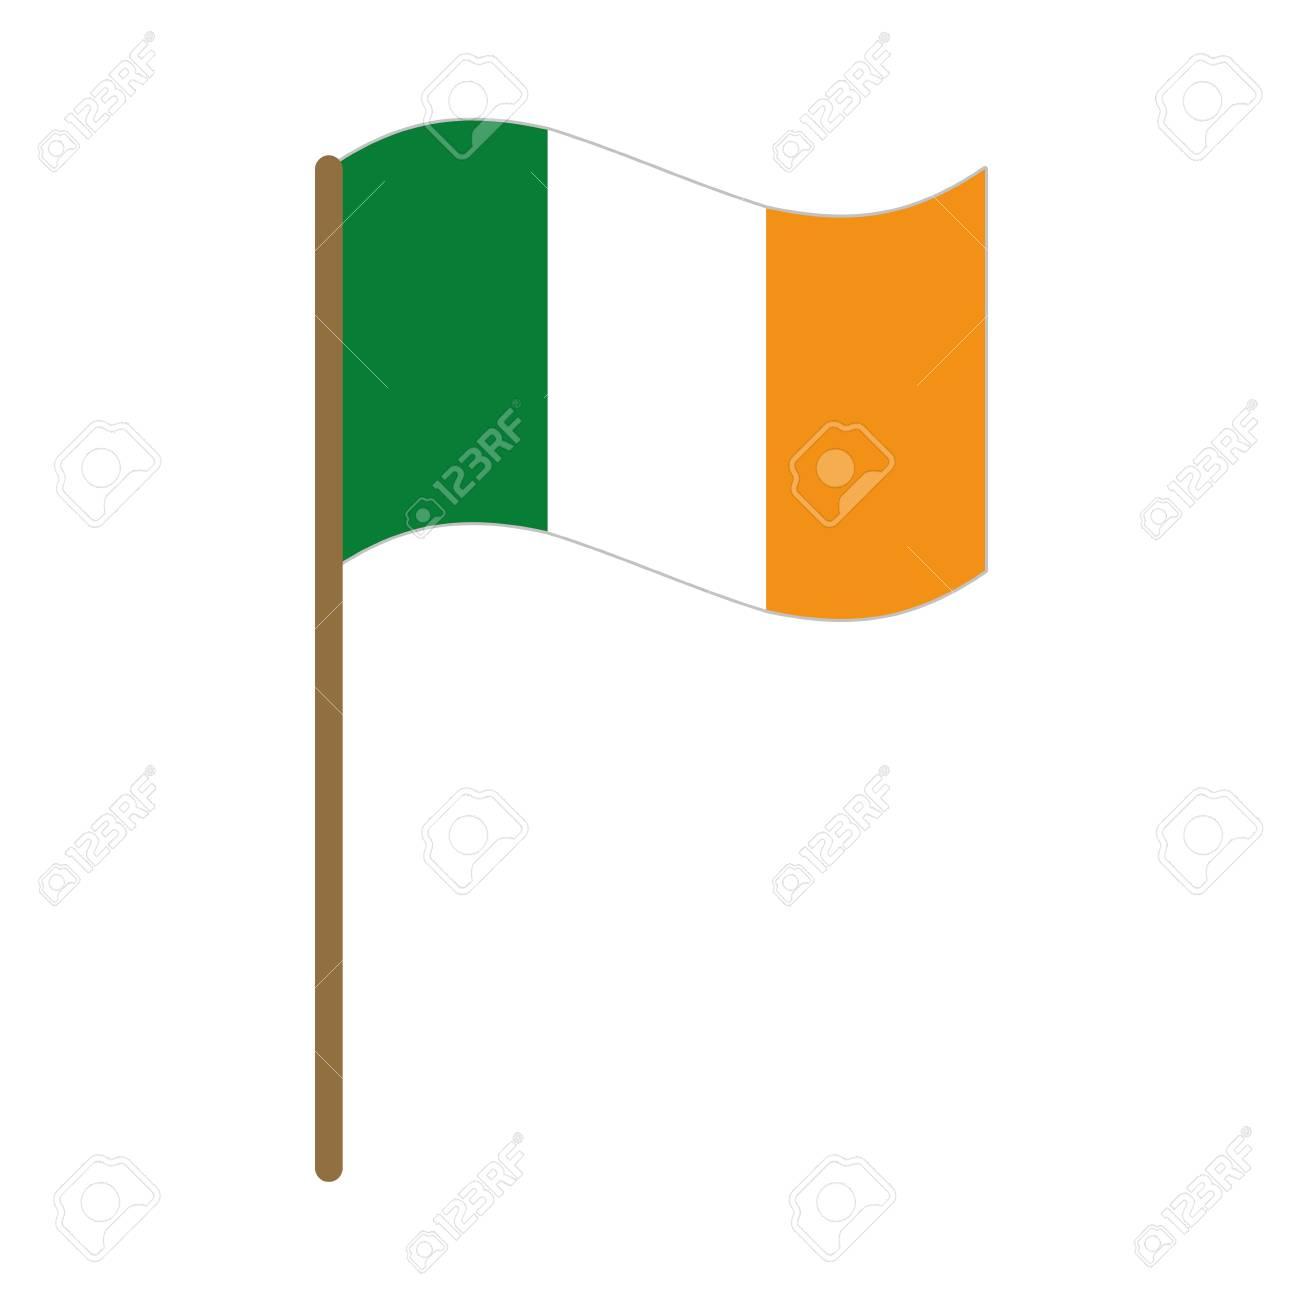 ireland flag isolated icon vector illustration design - 125896498